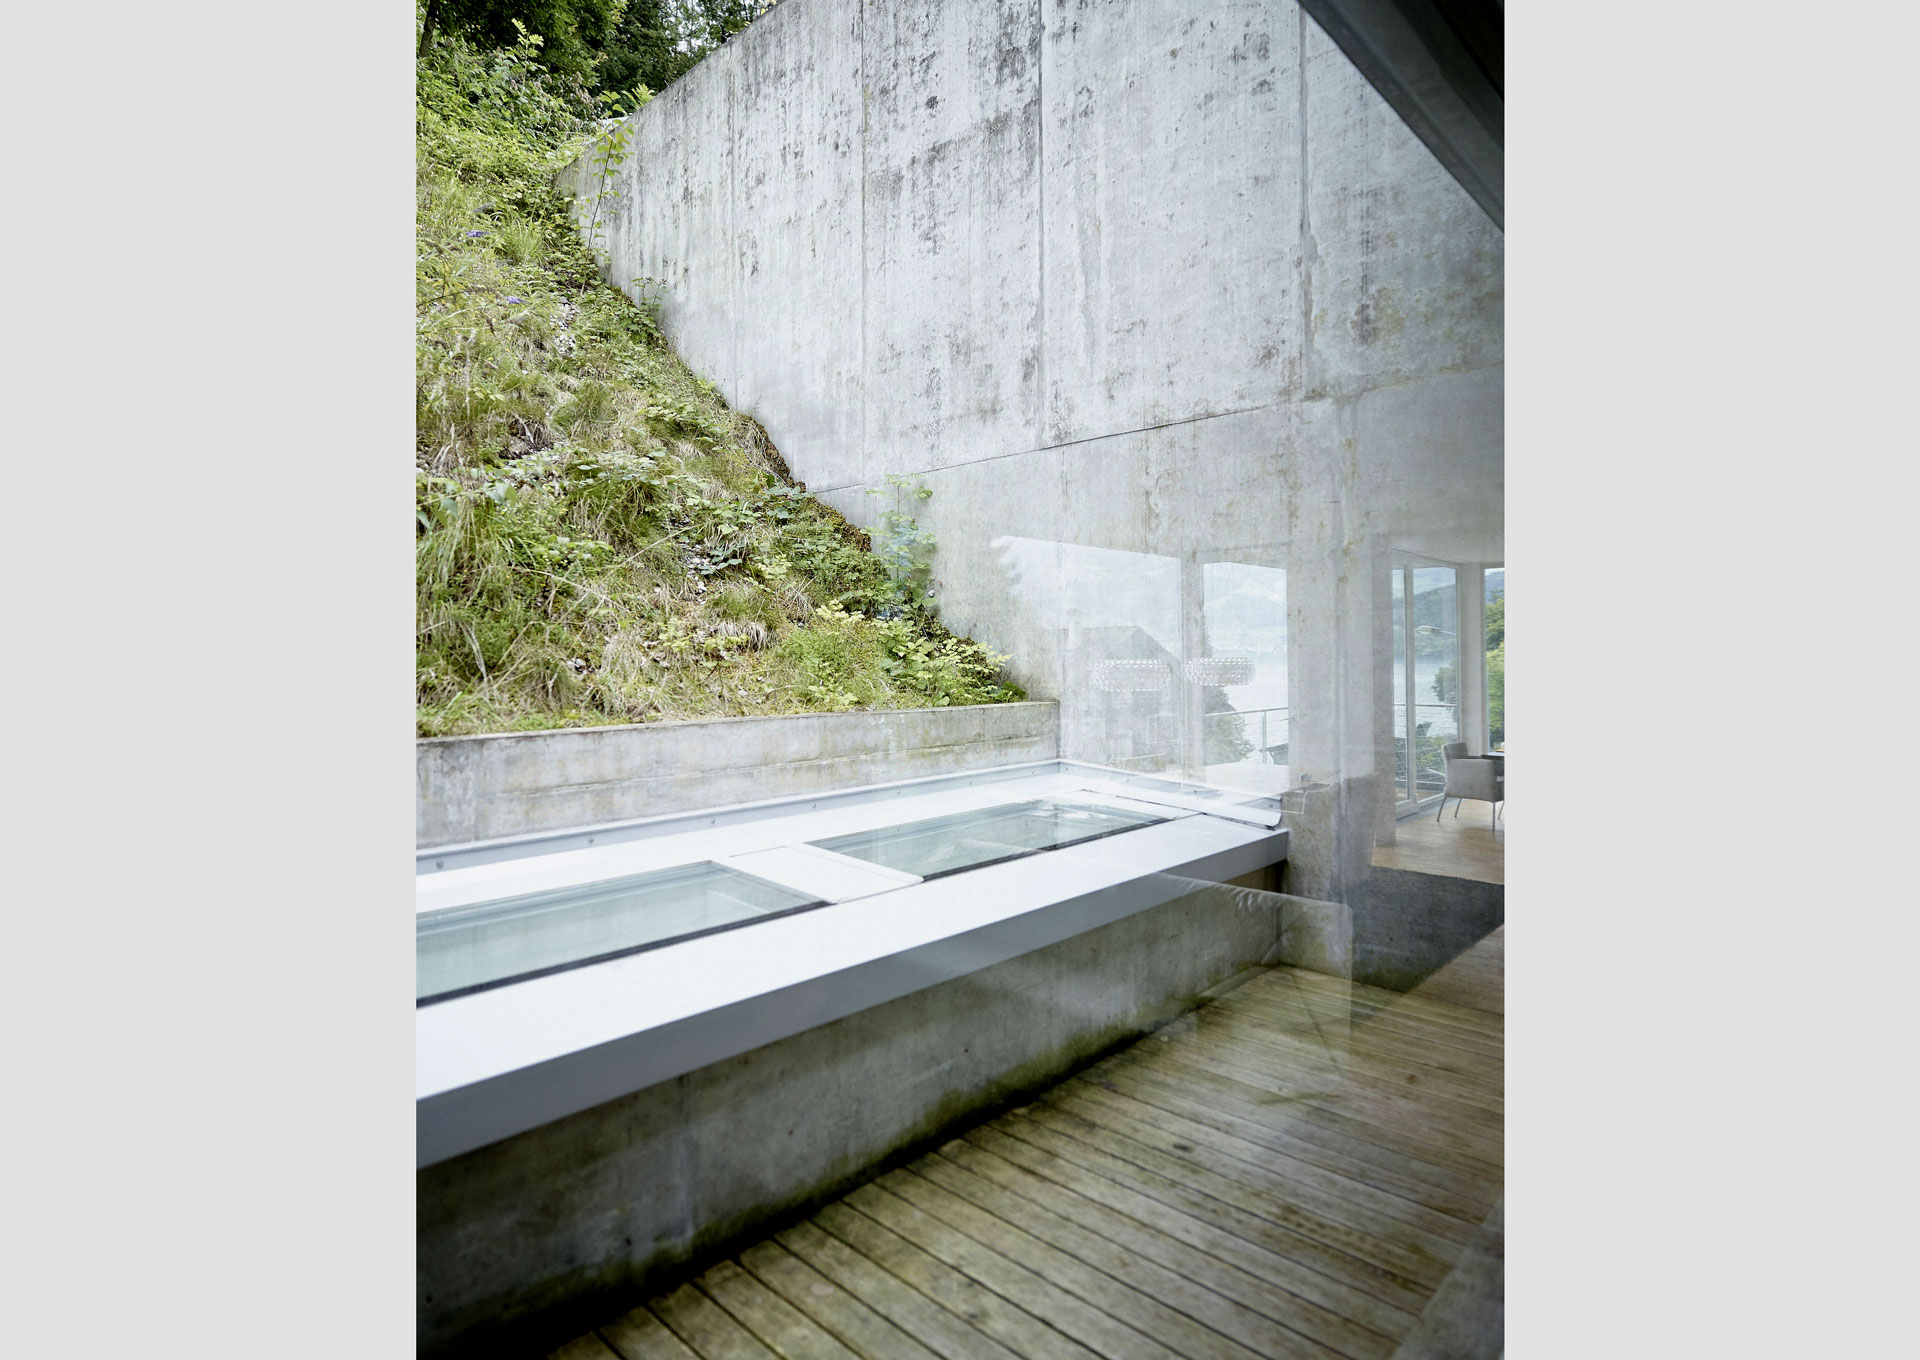 mondrianHouse-lakesidedevelopment-lsd-swiss-2-2